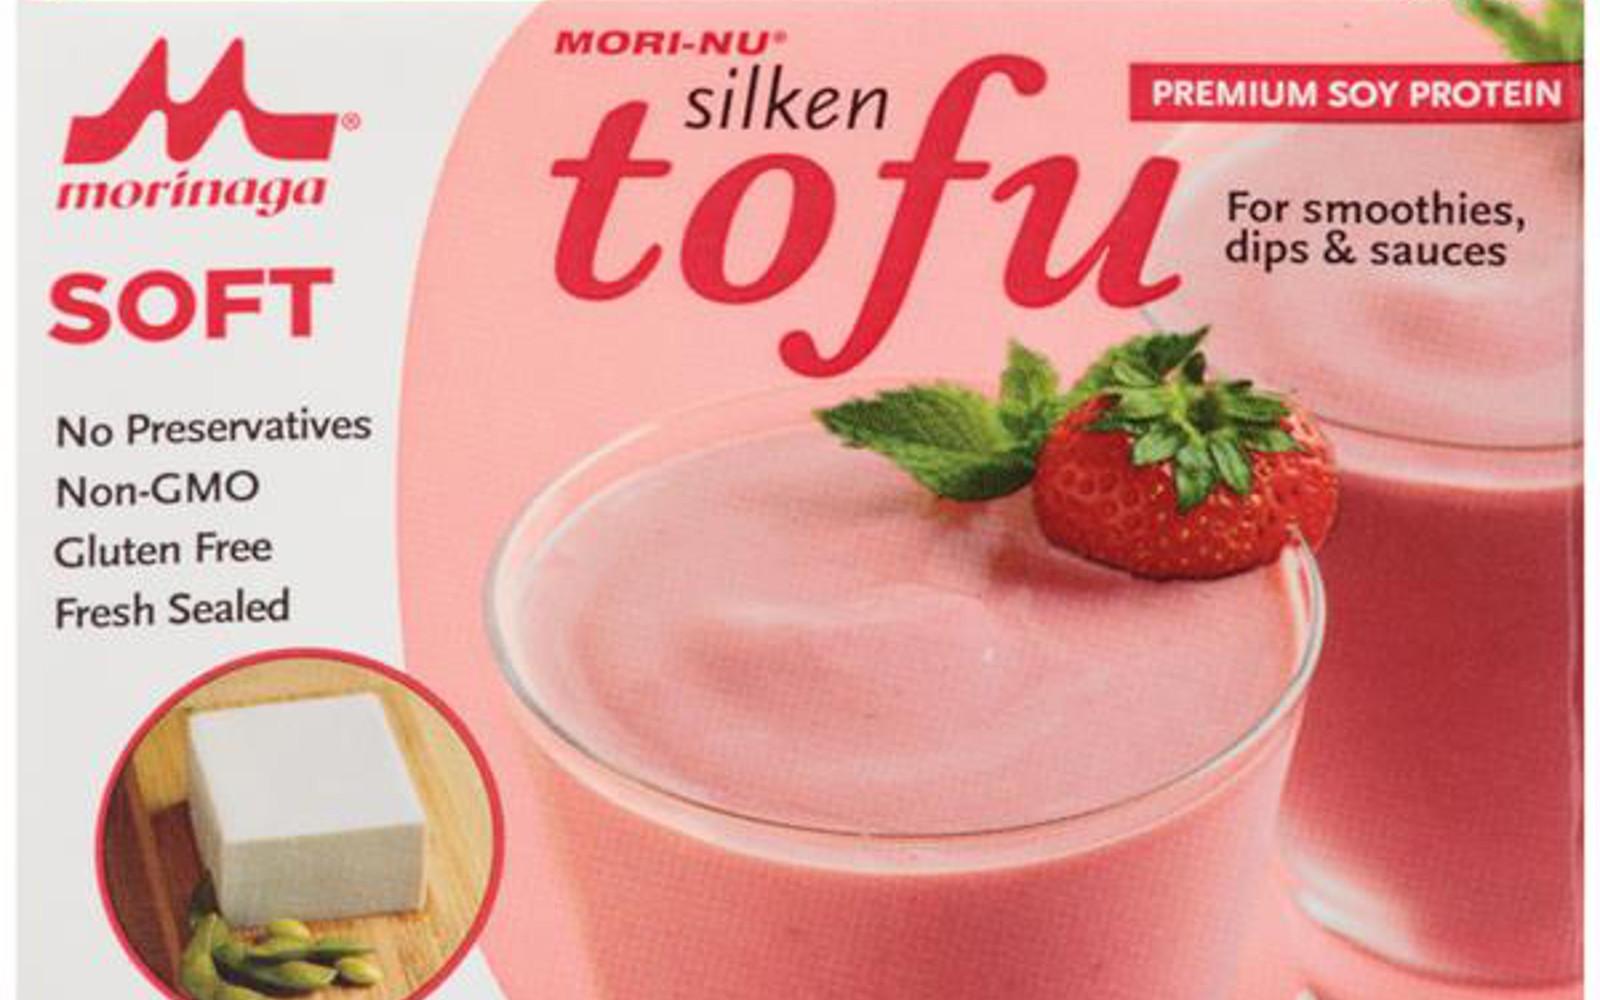 Silken tofu protein